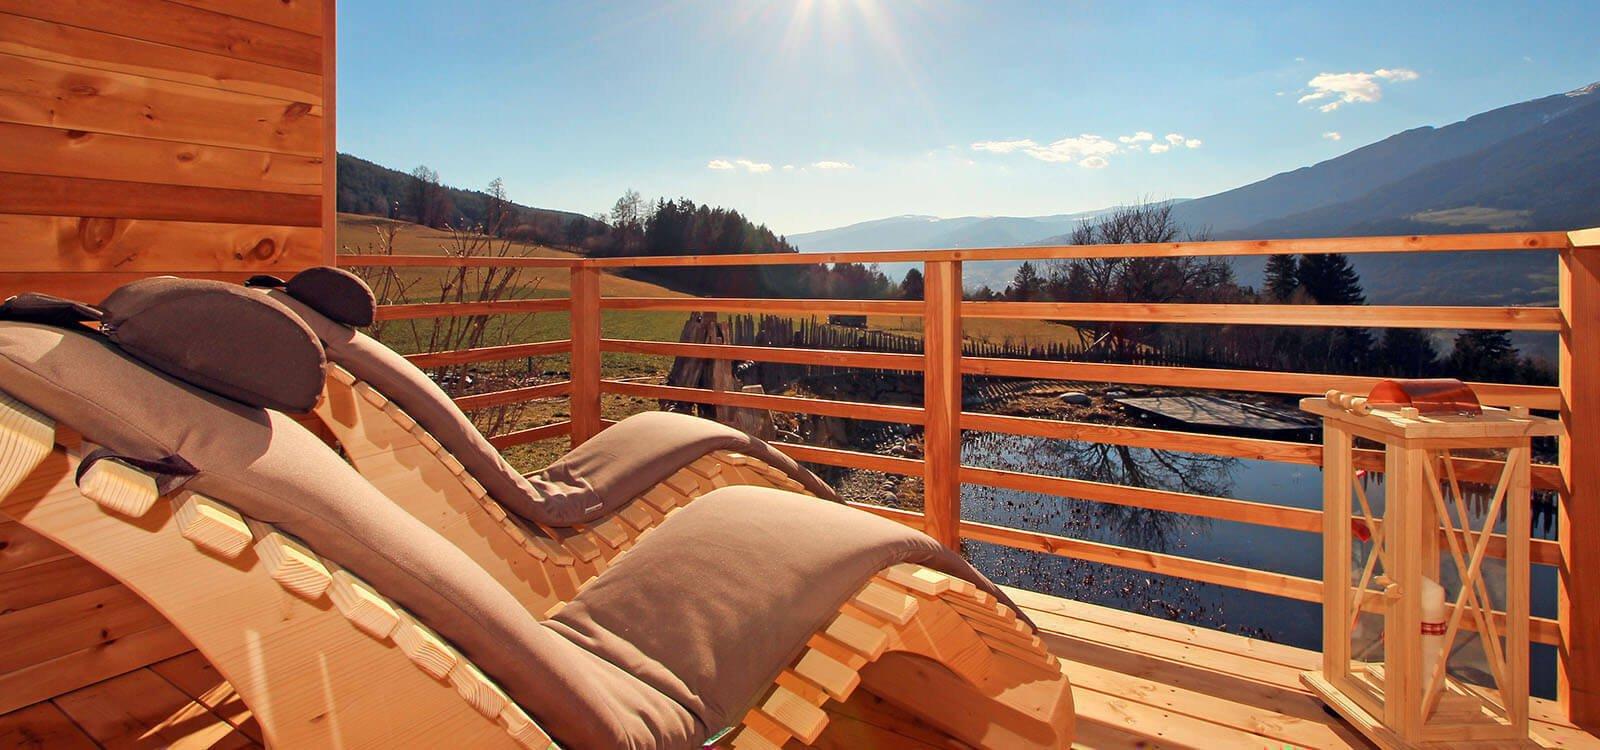 Wellness am Frötscherhof Mellaun | Naturbadeteich - Sauna - Ruheräume